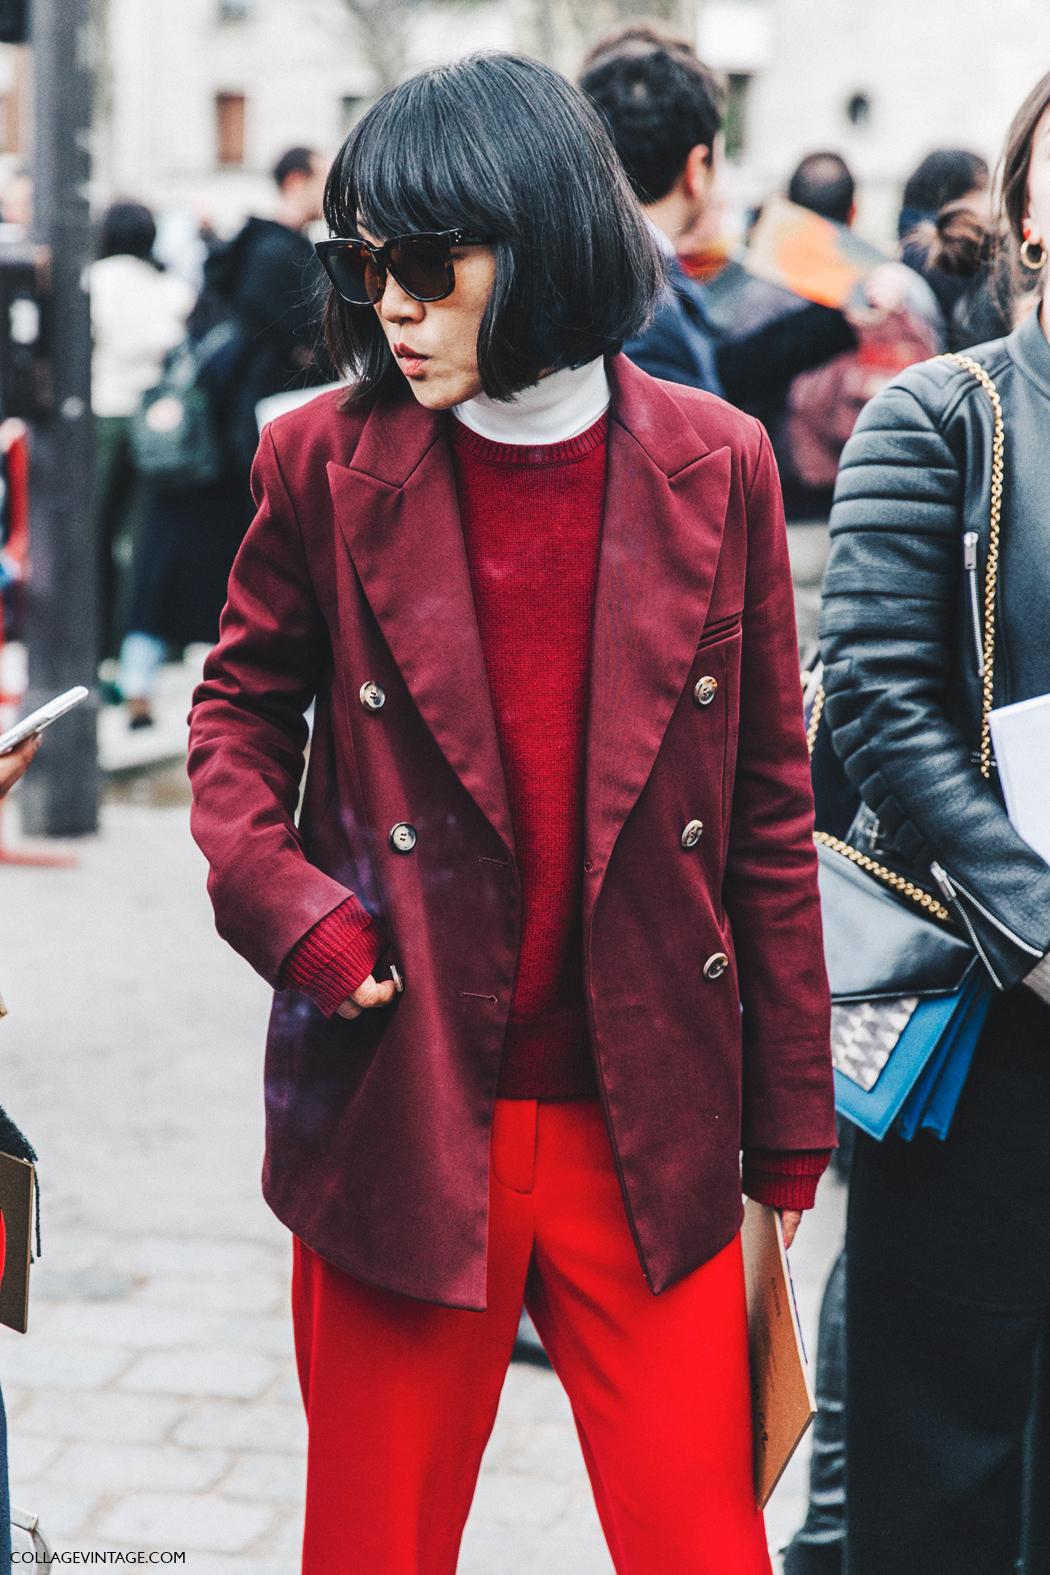 PFW-Paris_Fashion_Week_Fall_2016-Street_Style-Collage_Vintage-Red_Burgundy-